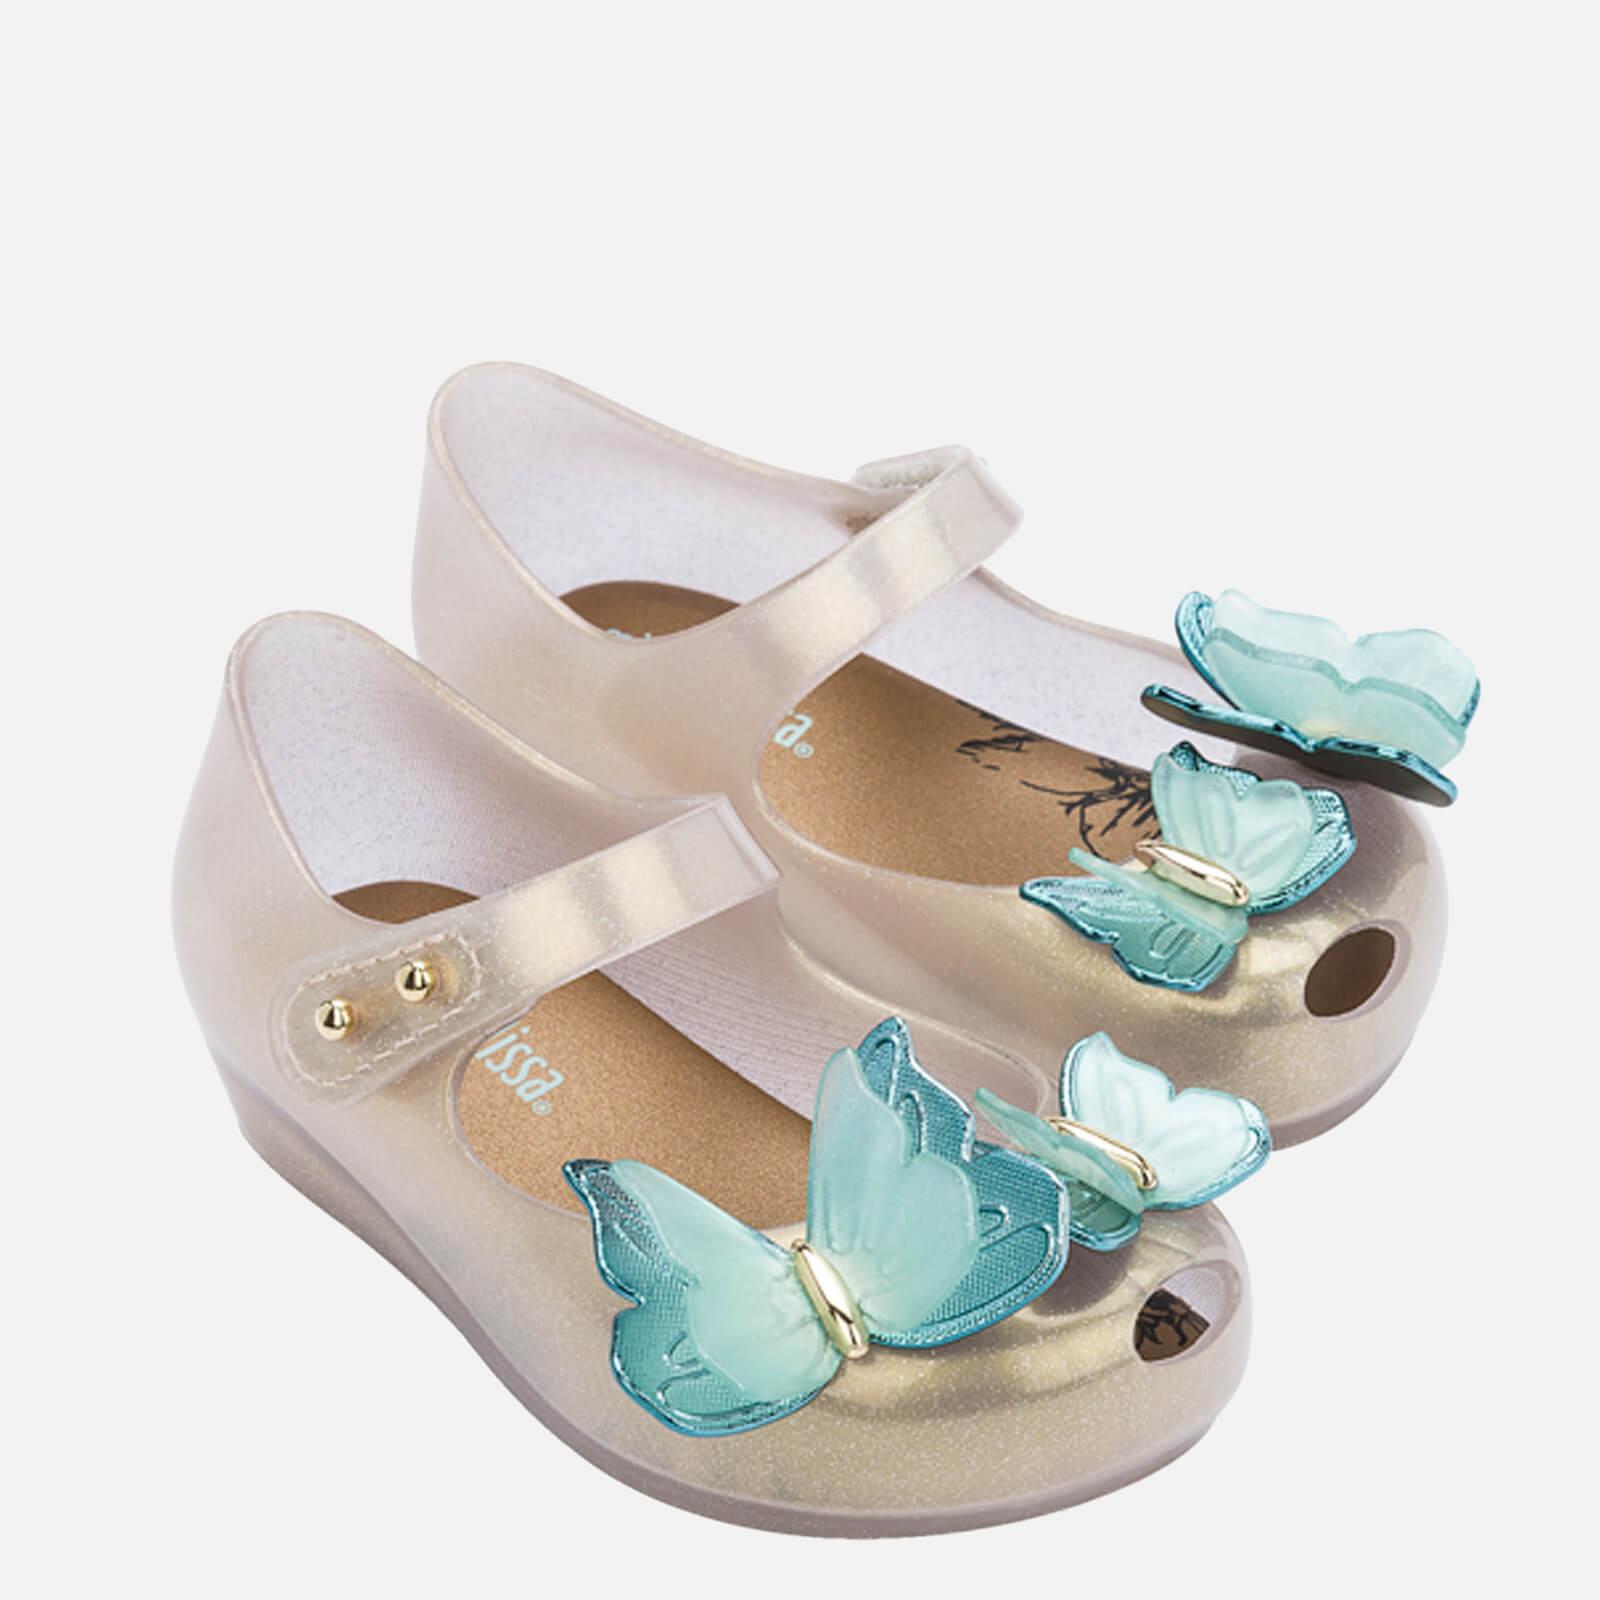 Mini Melissa Toddlers' Mini Ultragirl Butterfly Ballet Flats - Pearl Contrast - UK 5 Toddler